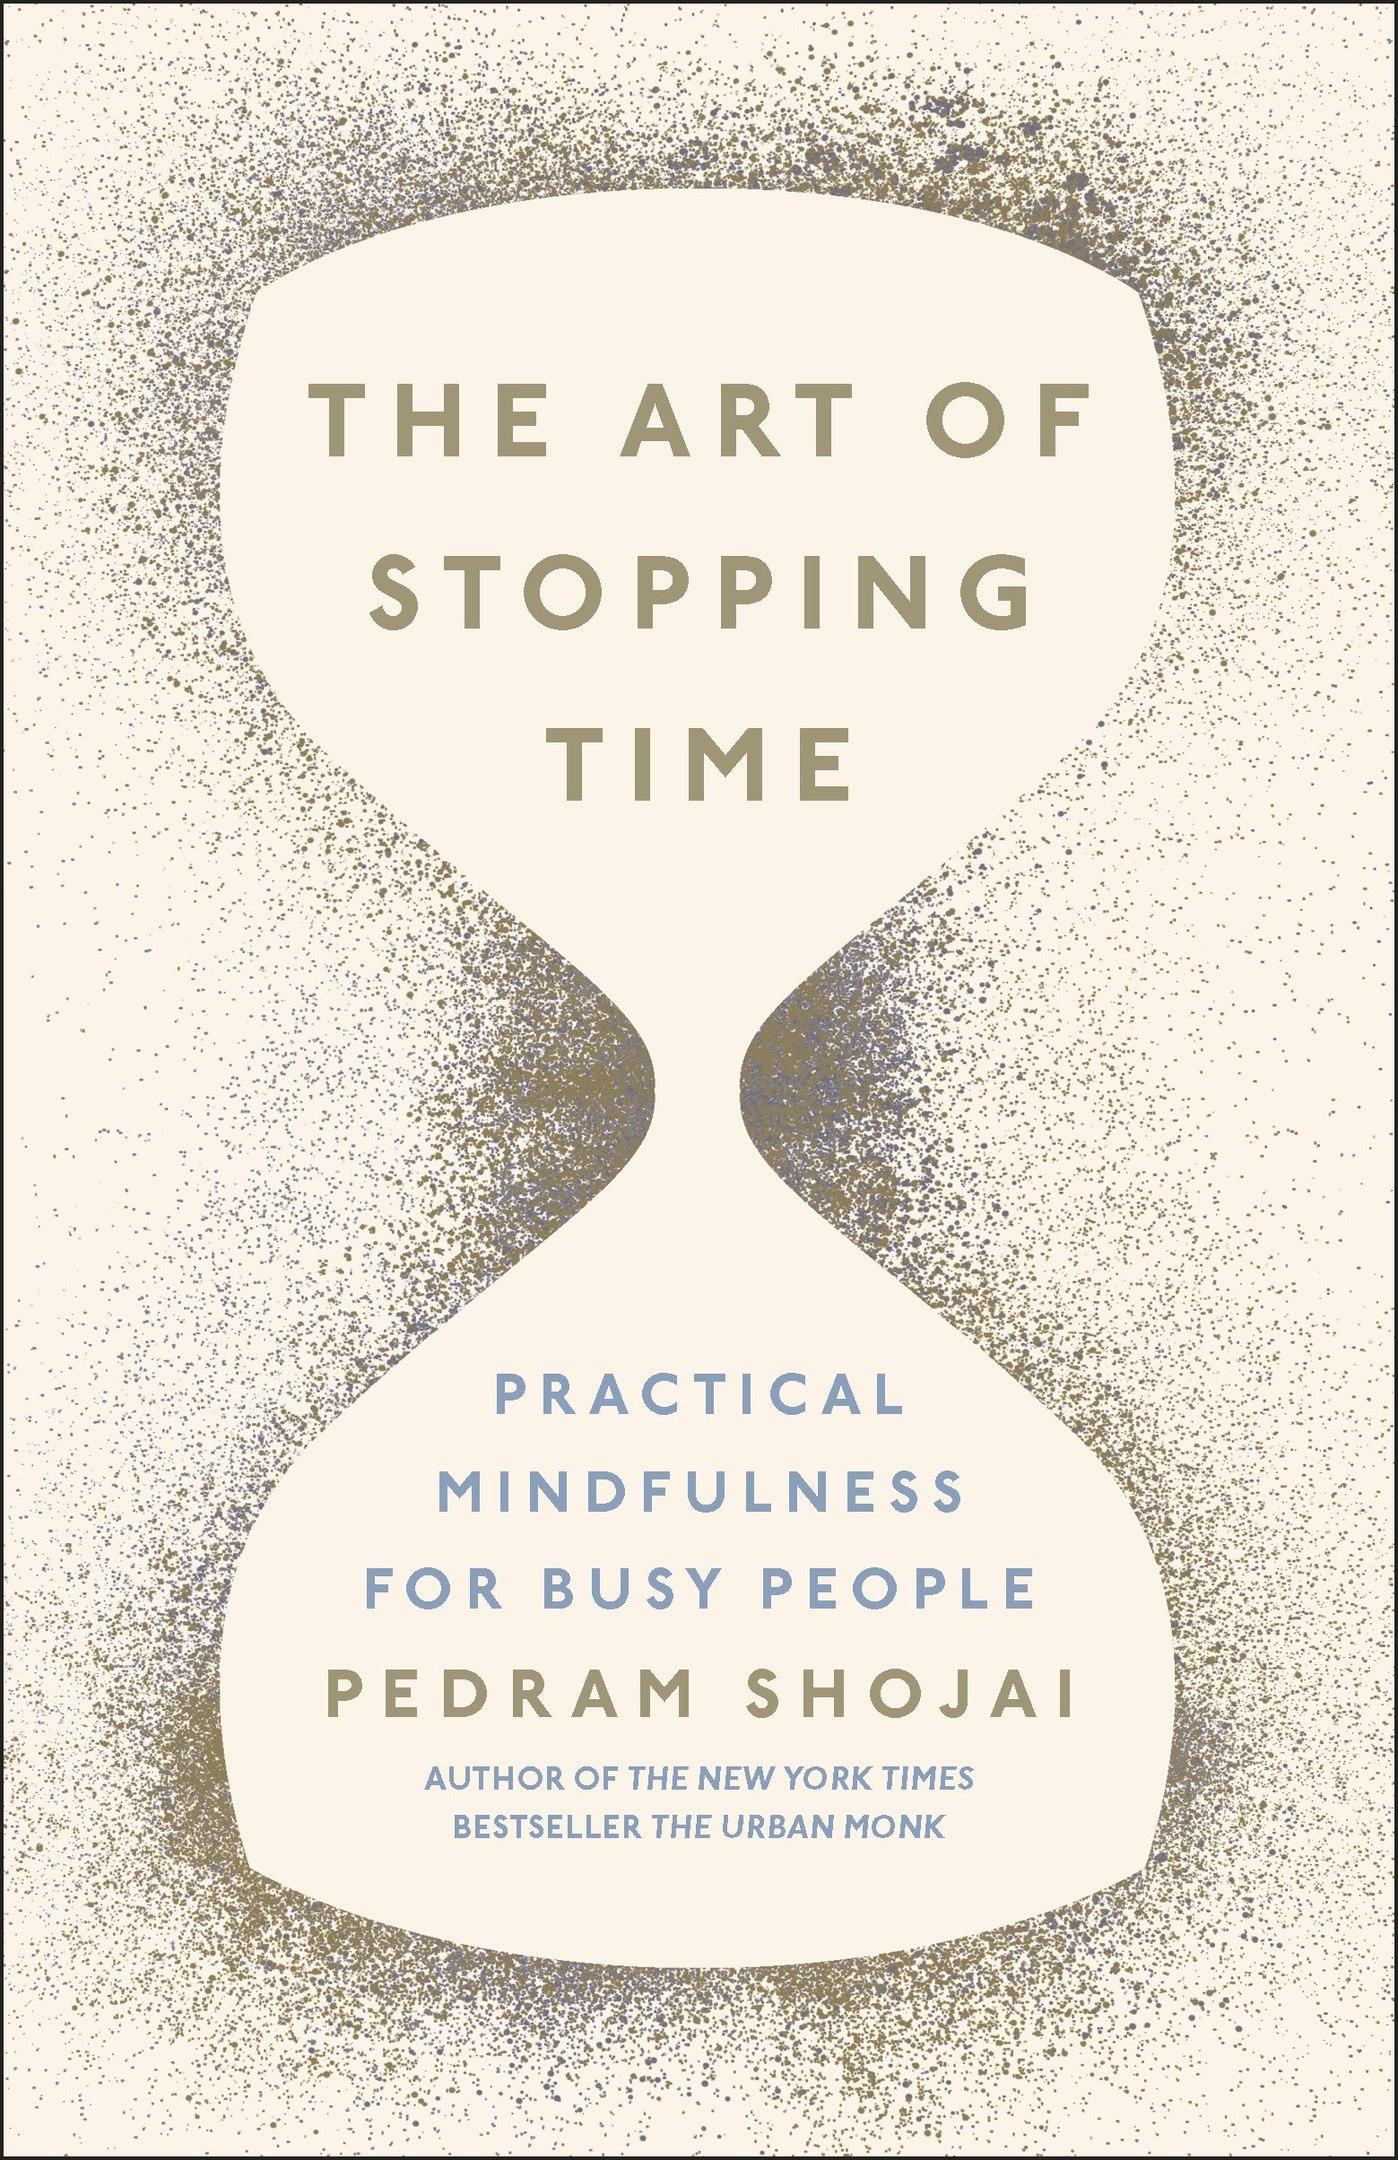 Pedram Shojai – The Art Of Stopping Time